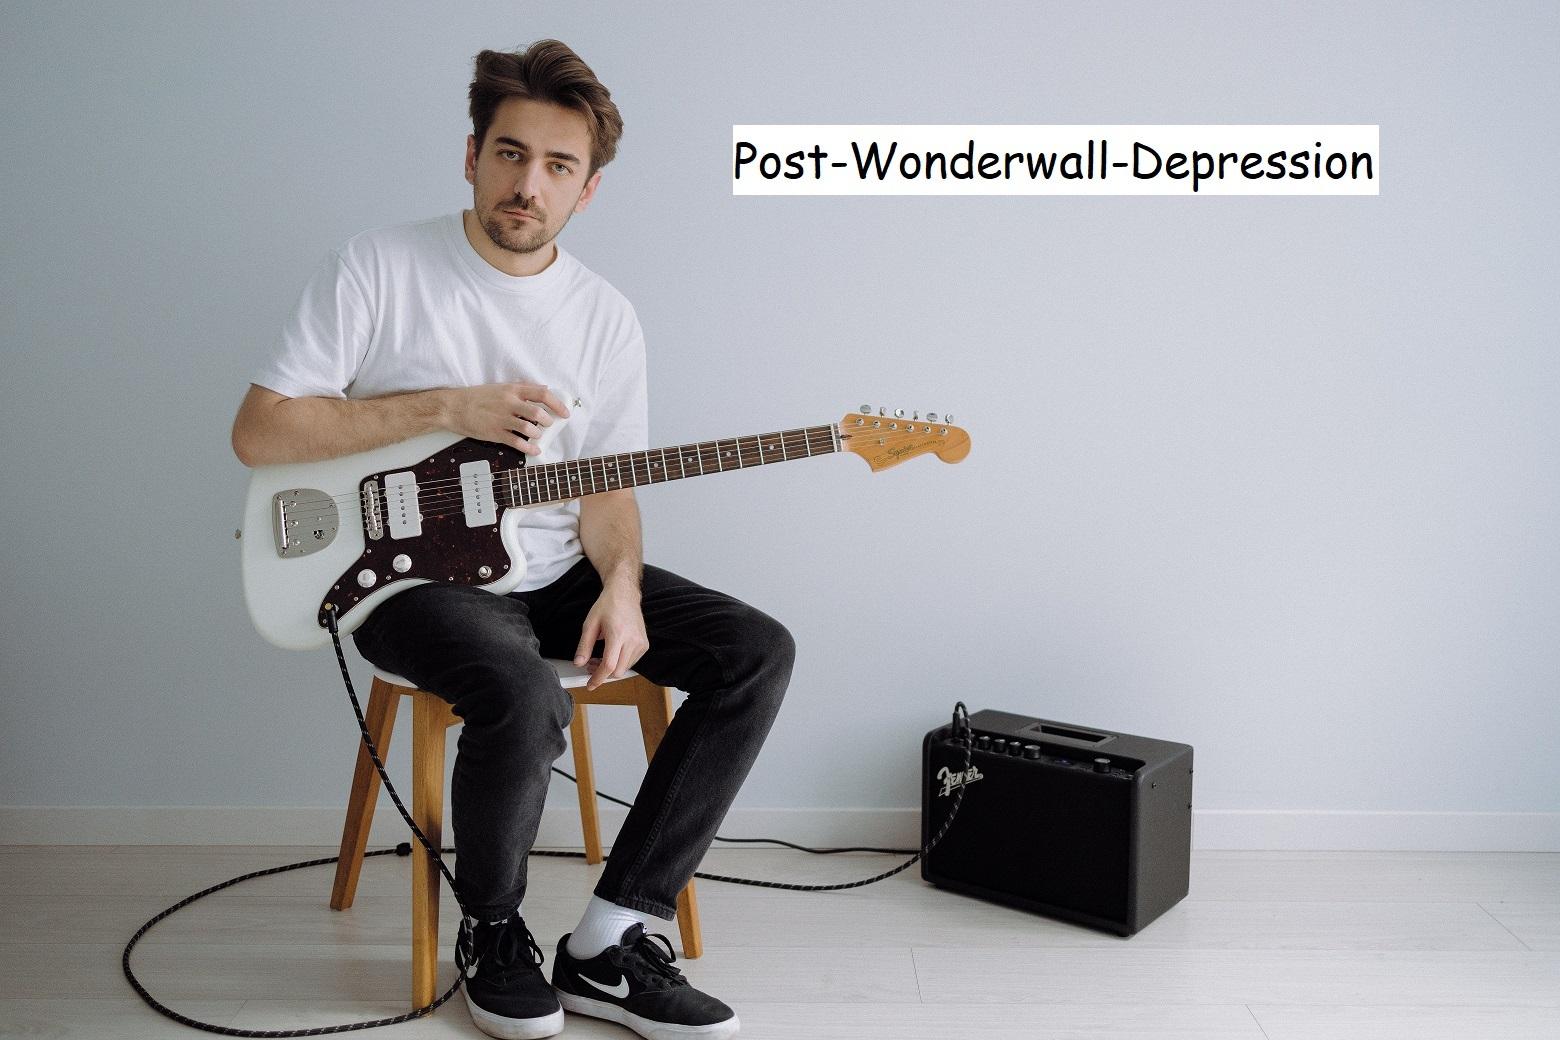 "Klassischer Oasis ""Wonderwall"" Gitarrist. Foto: unsplash. Bearbeitung: Hannes Huß."